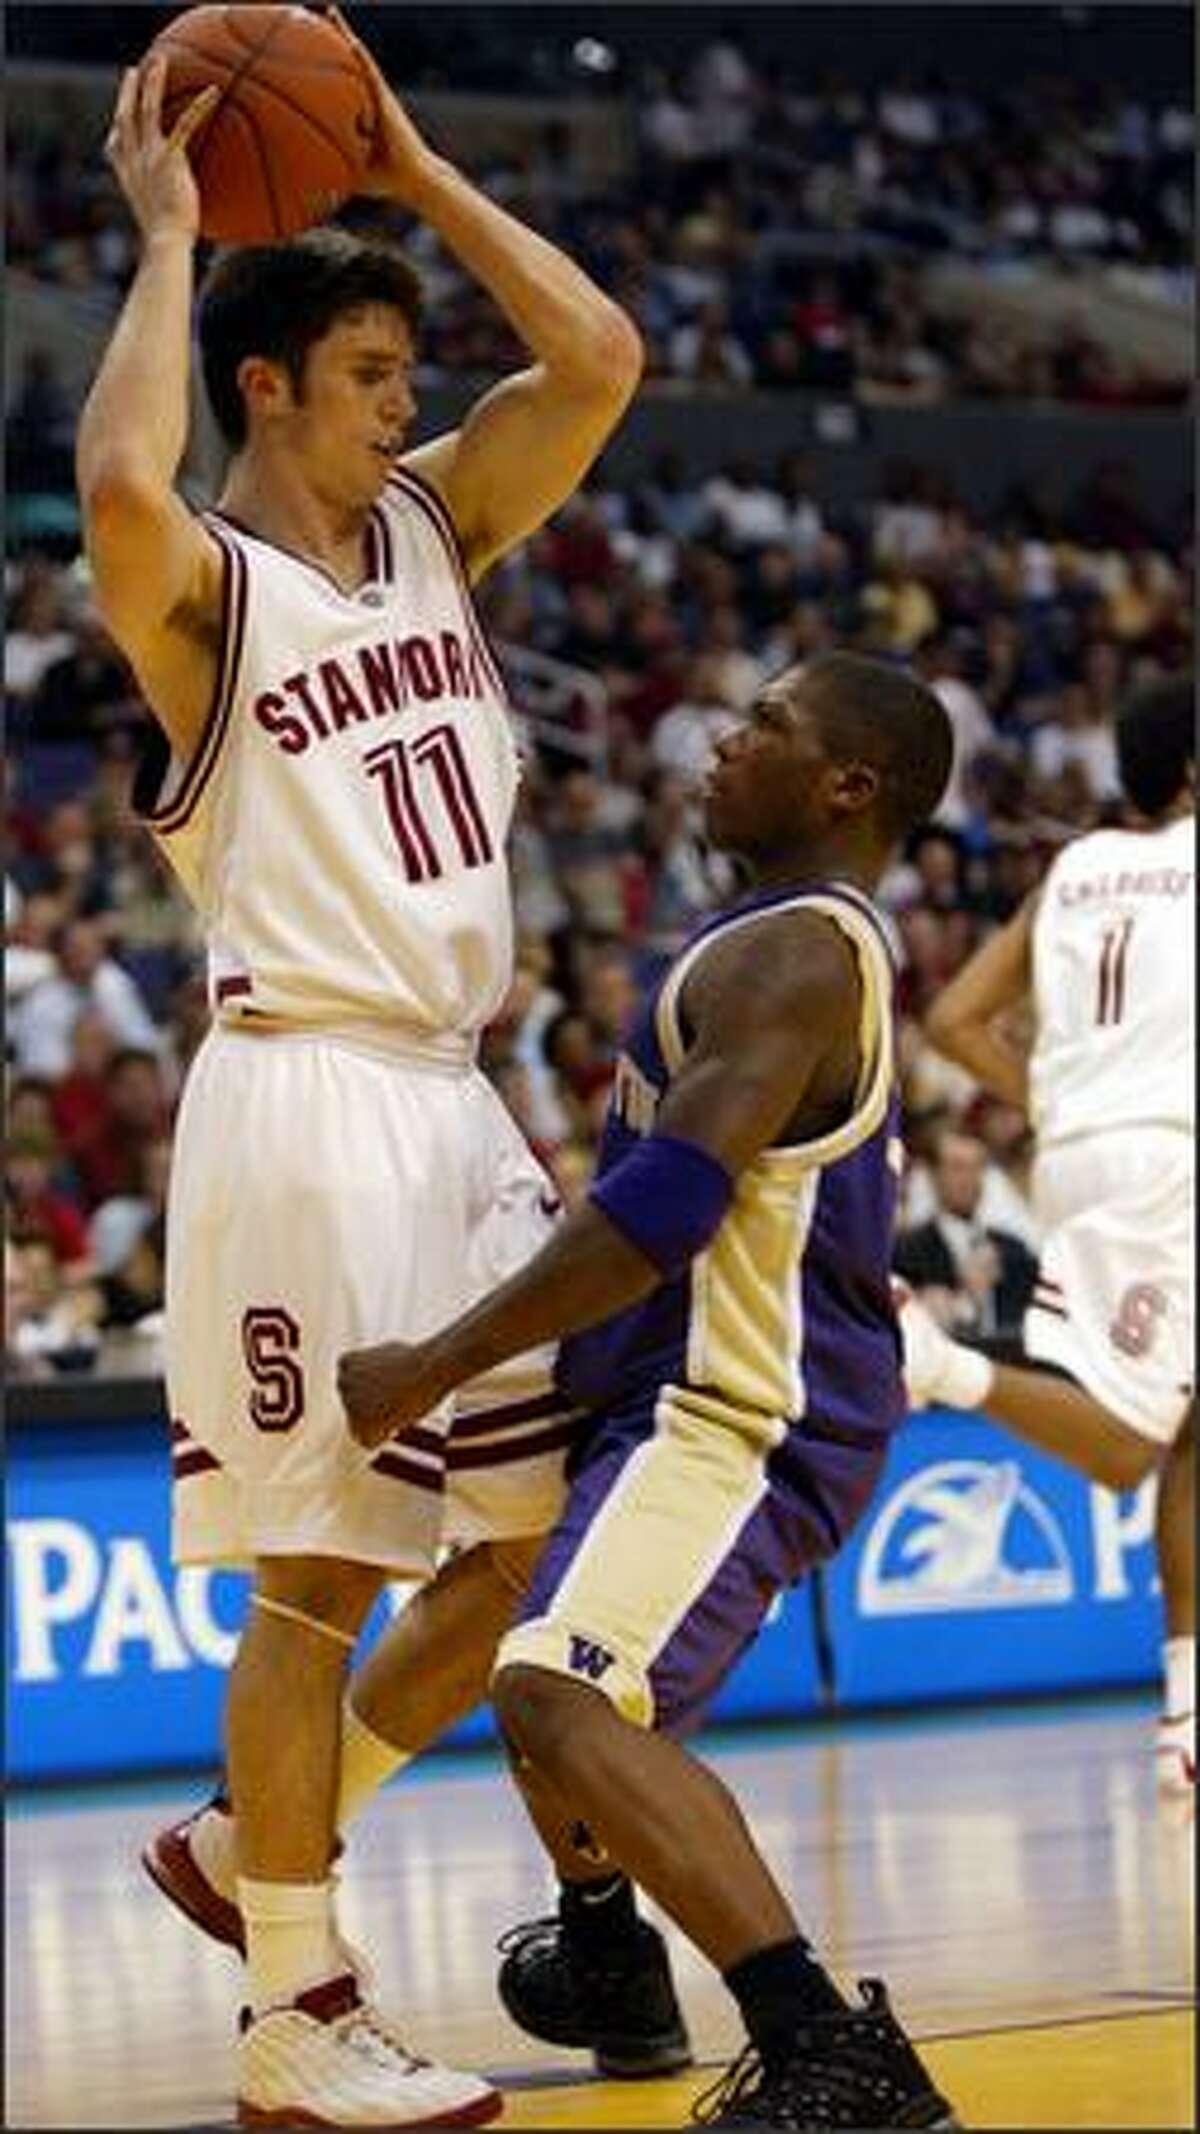 UW's Nate Robinson stops Stanford's Chris Hernandez in the first half.